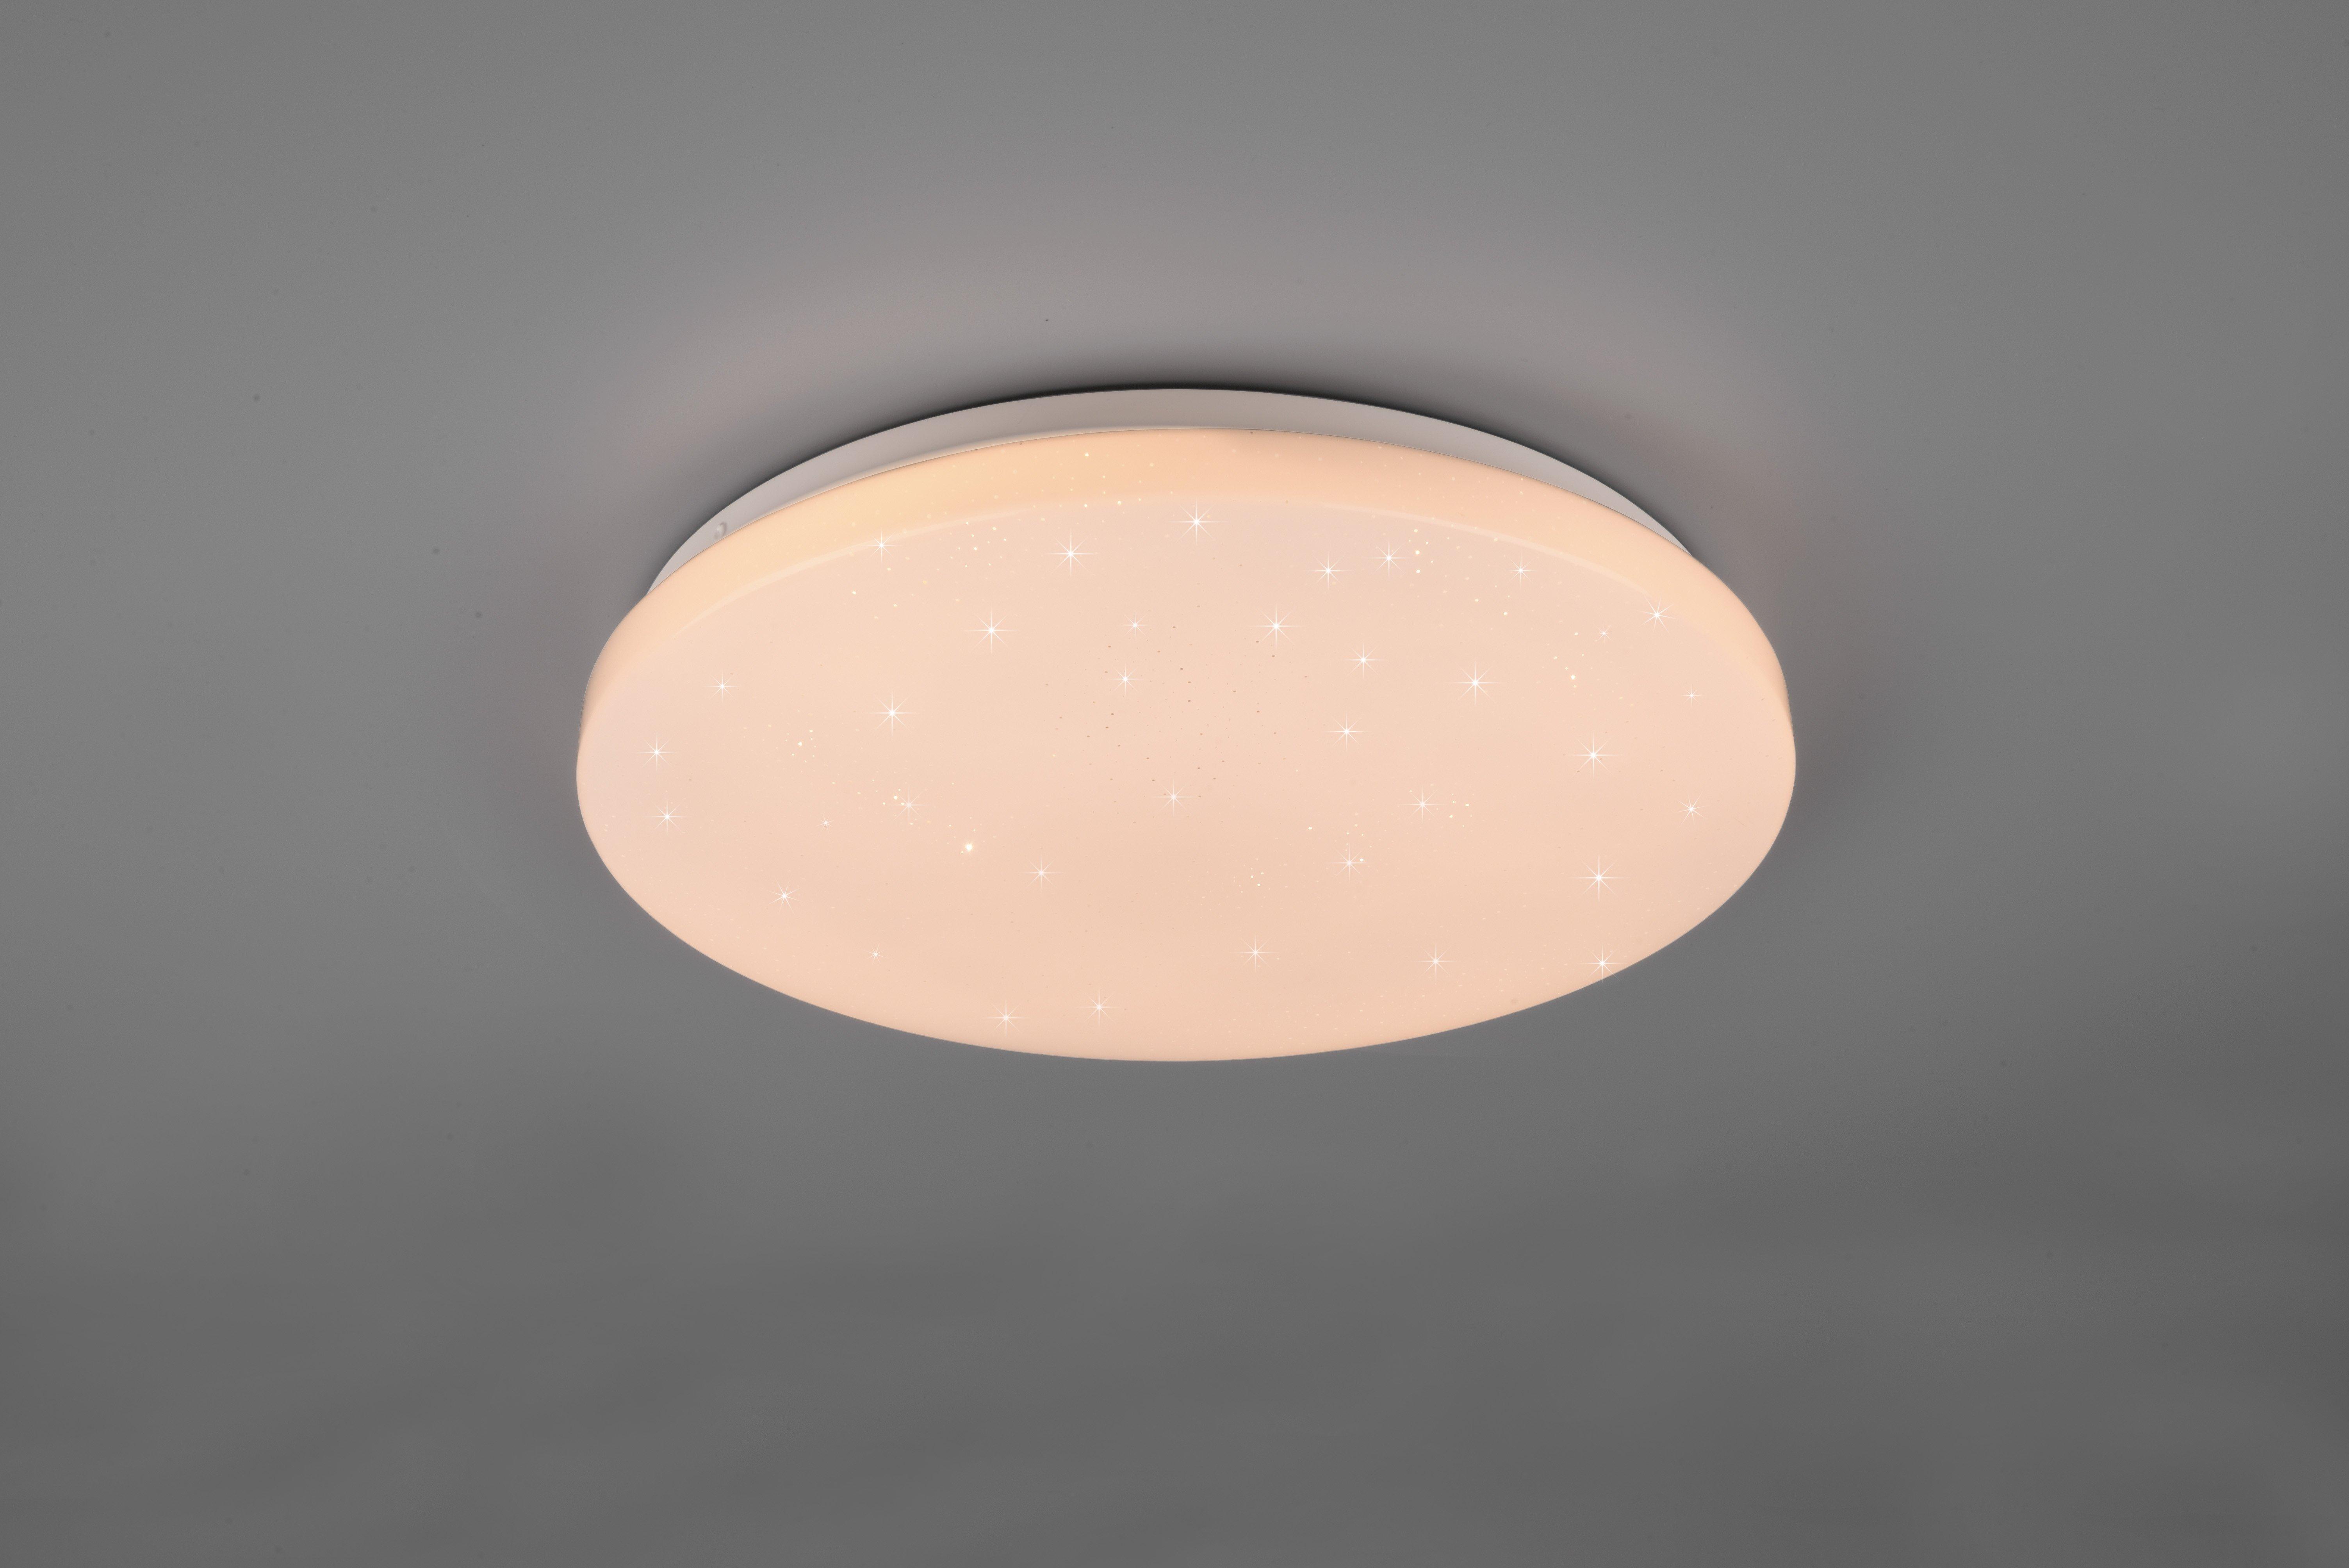 LED Deckenleuchte Kira